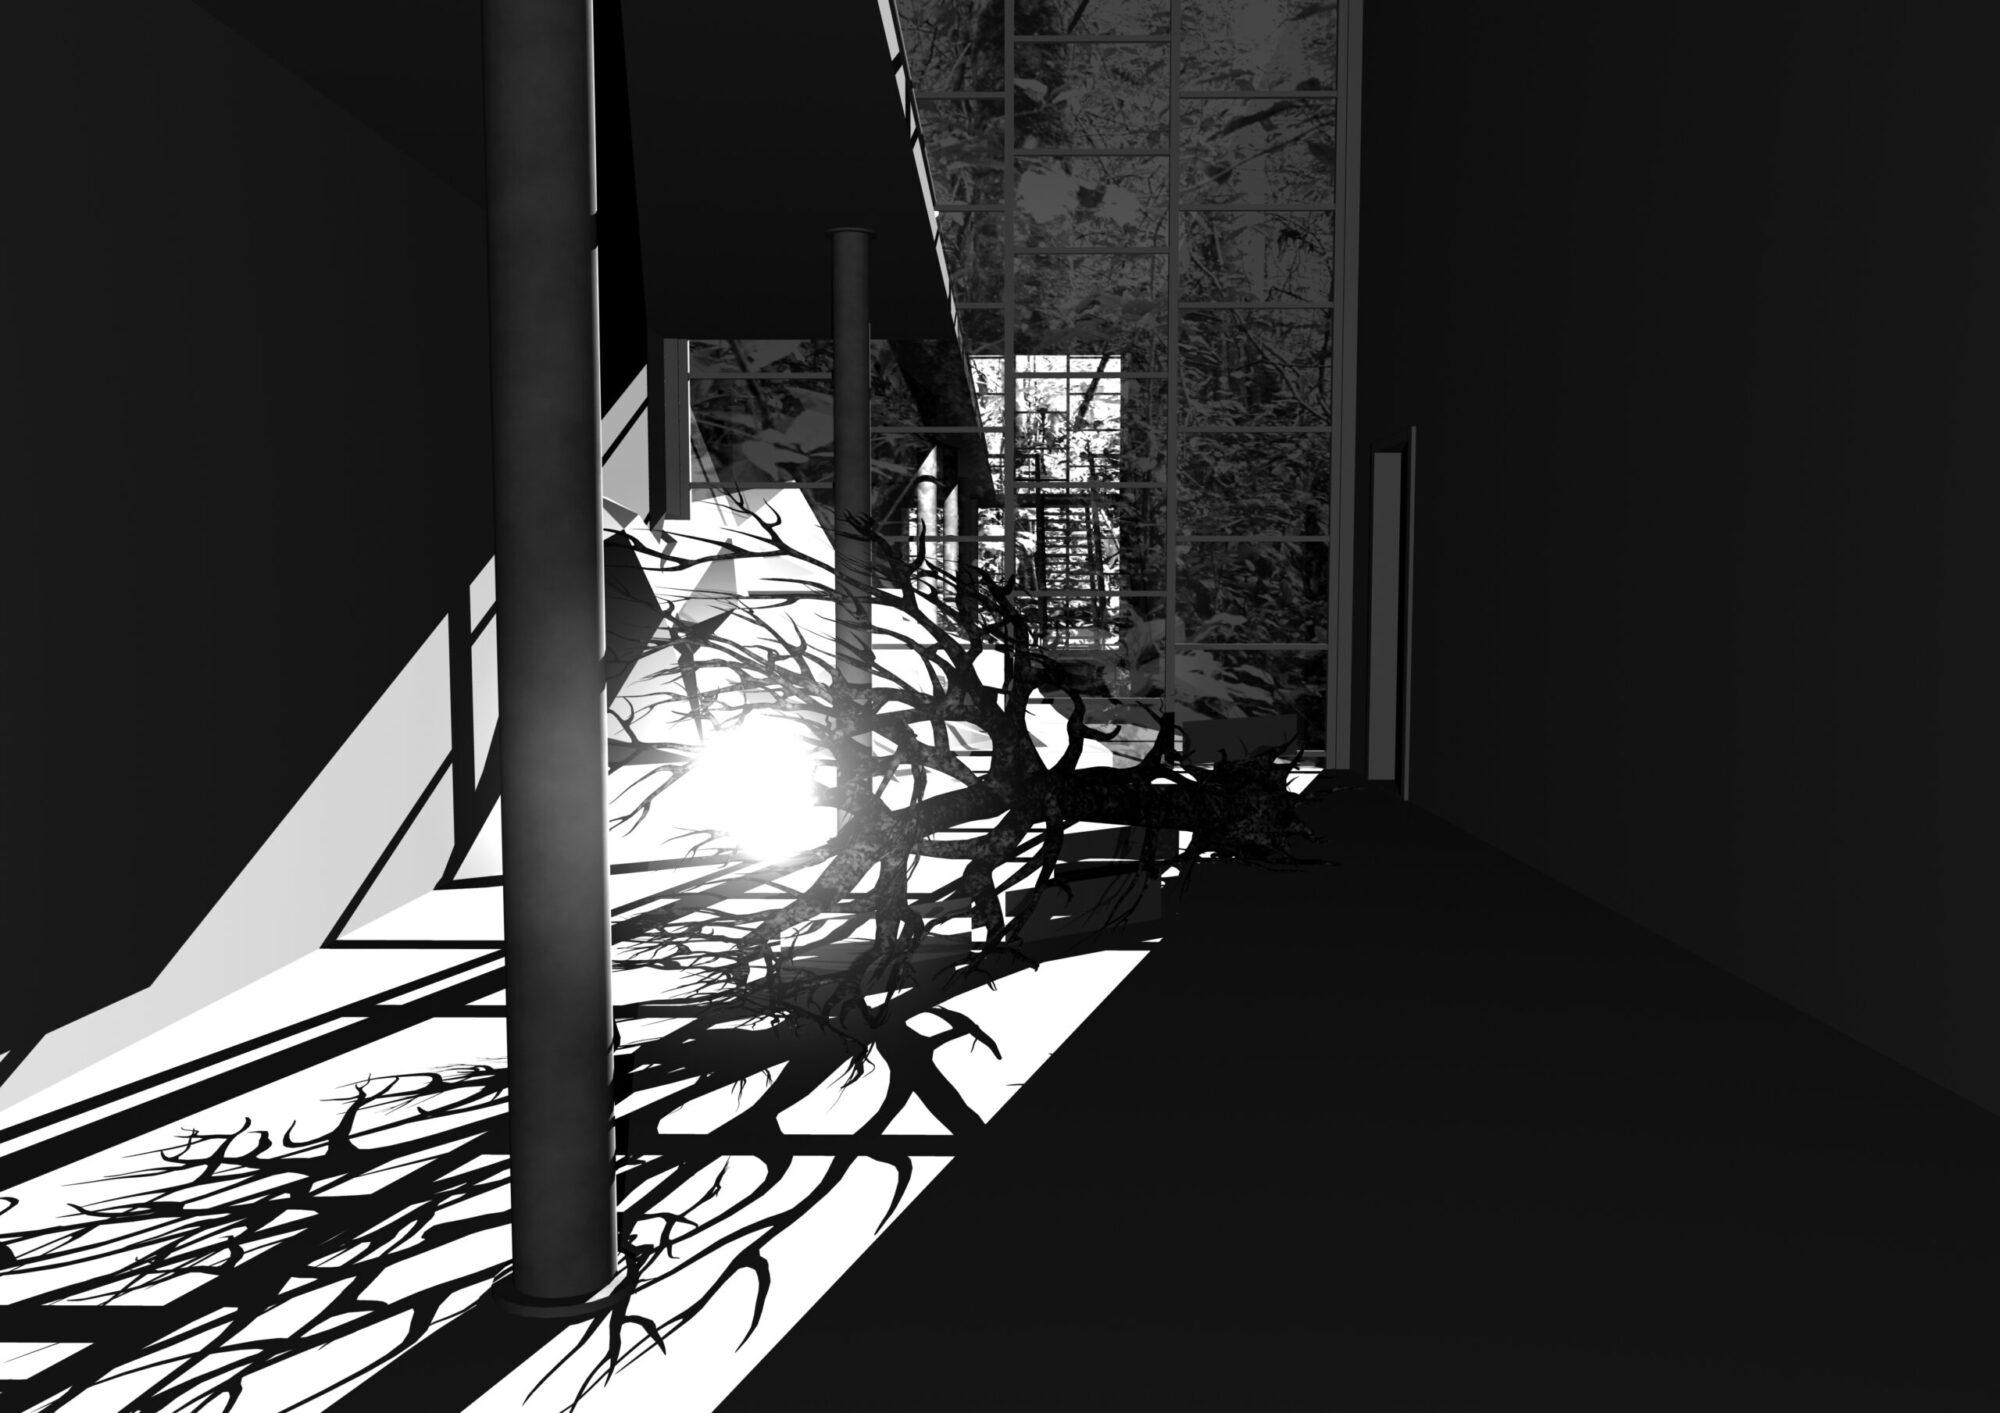 Ann Lislegaard, Crystal World (after J. G. Ballard), 3D animation, 2006